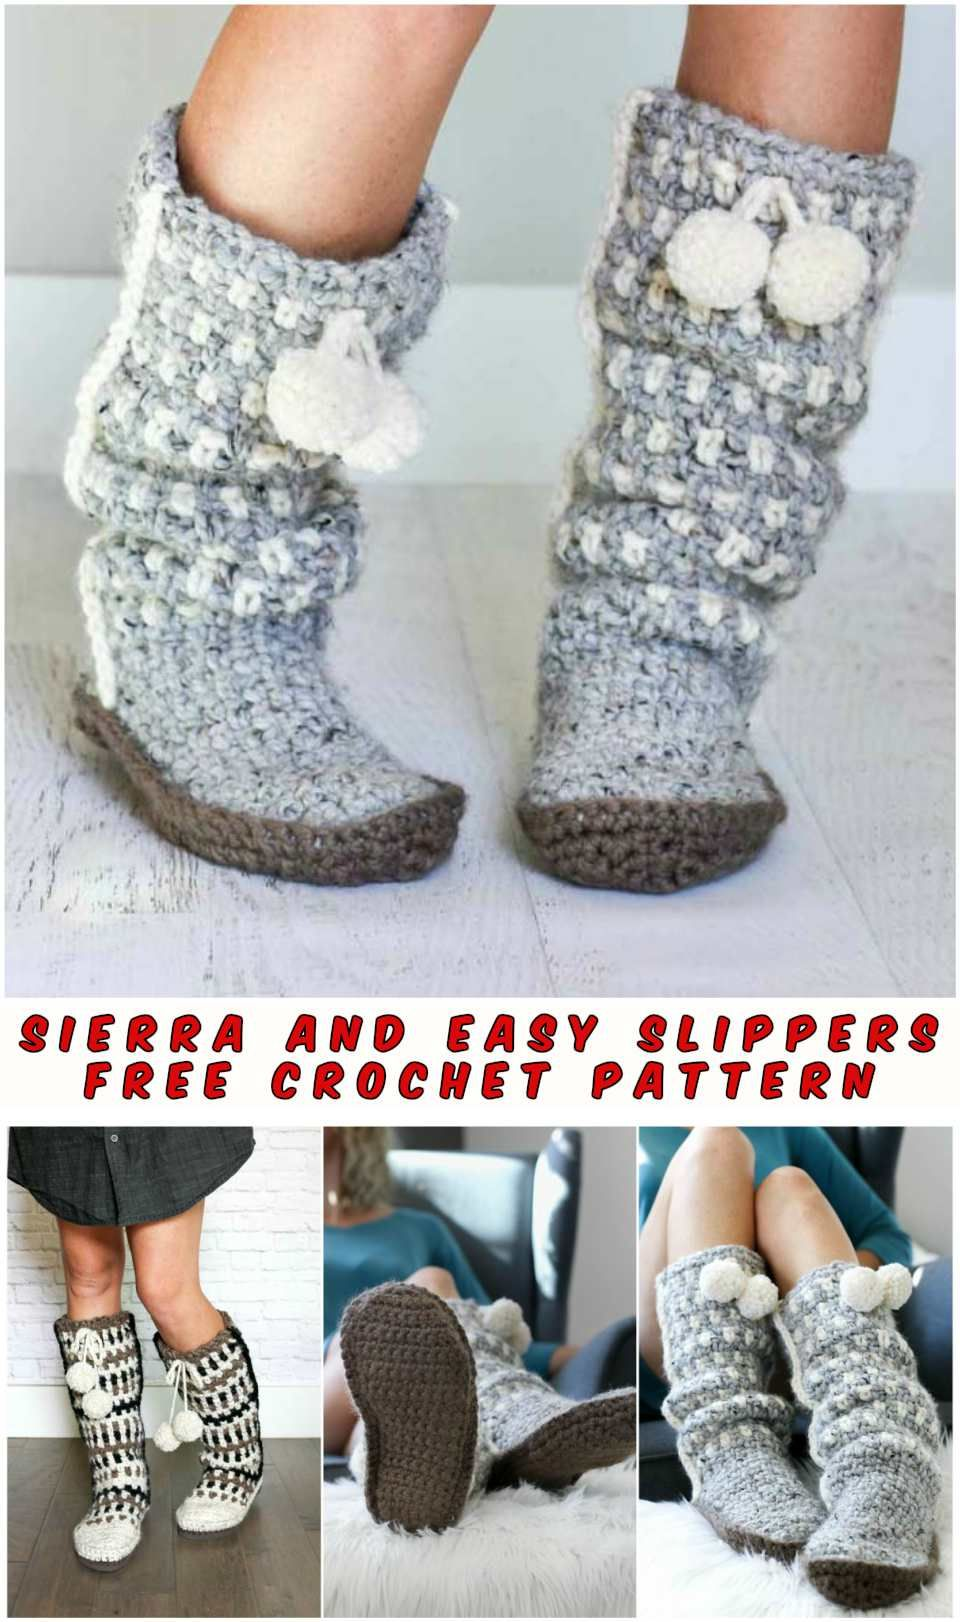 Sierra and Easy Slippers - Free Crochet Pattern | Tejidos bebe ...